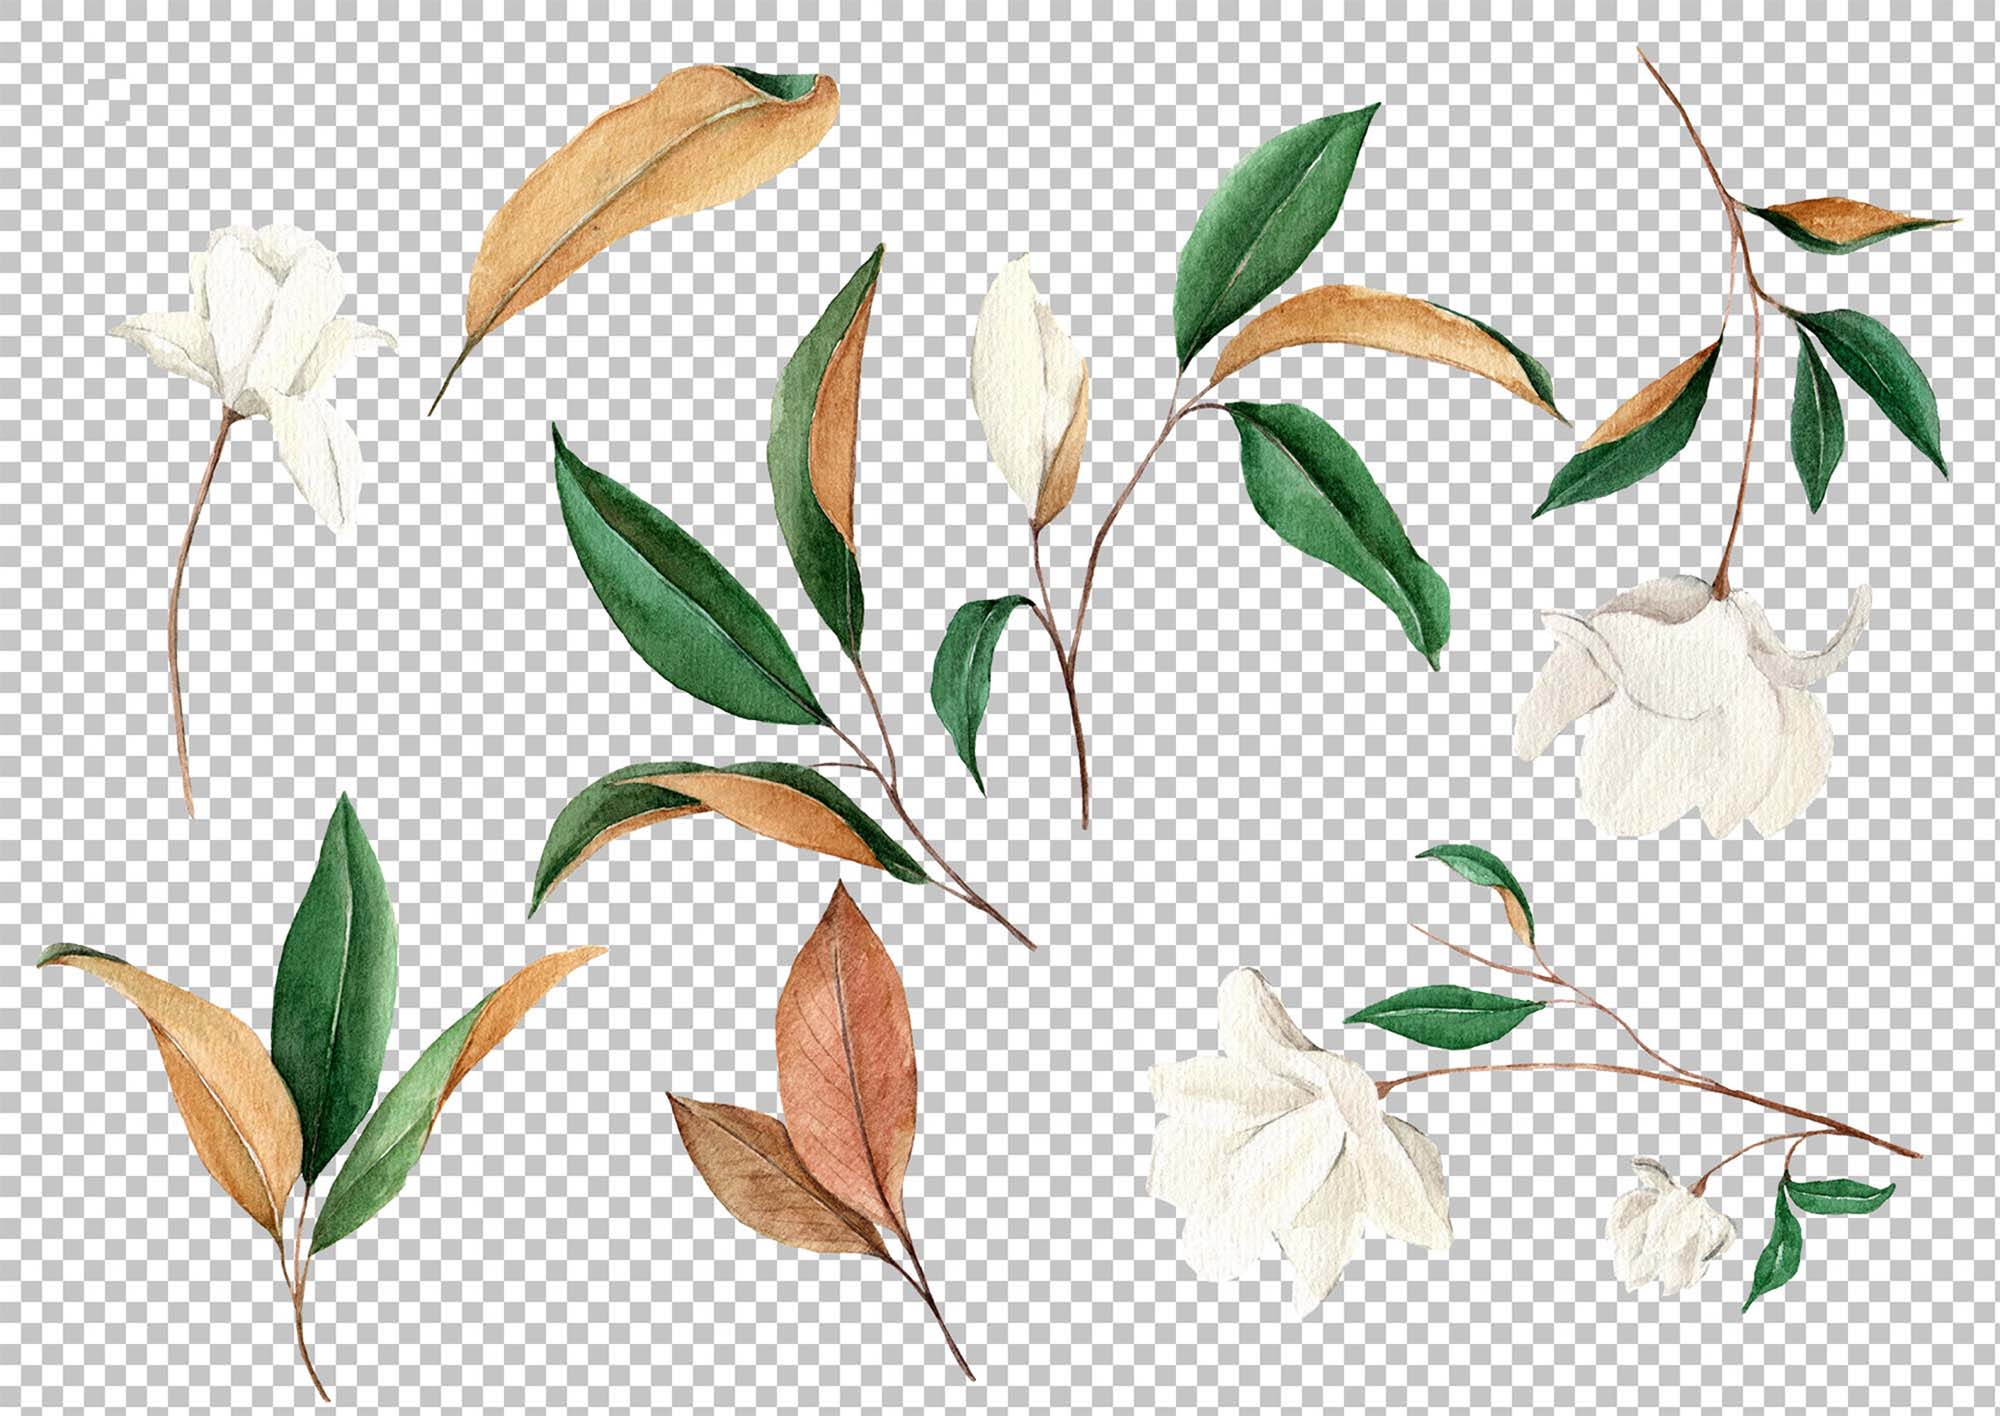 Magnolia Floral Graphic Design Elements 2